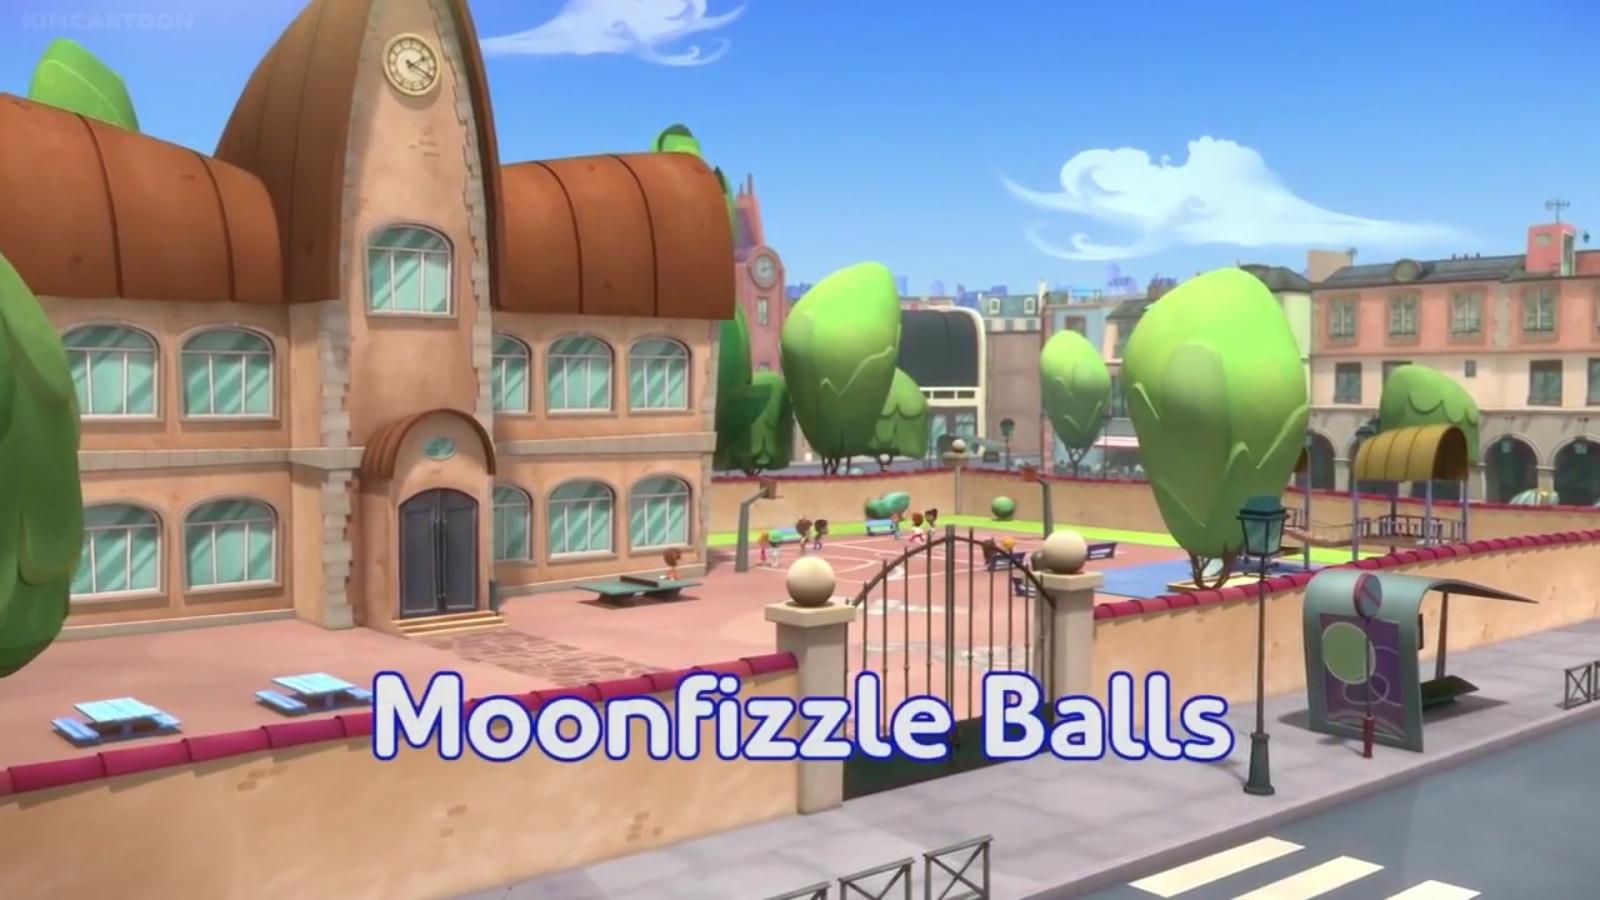 Moonfizzle Balls